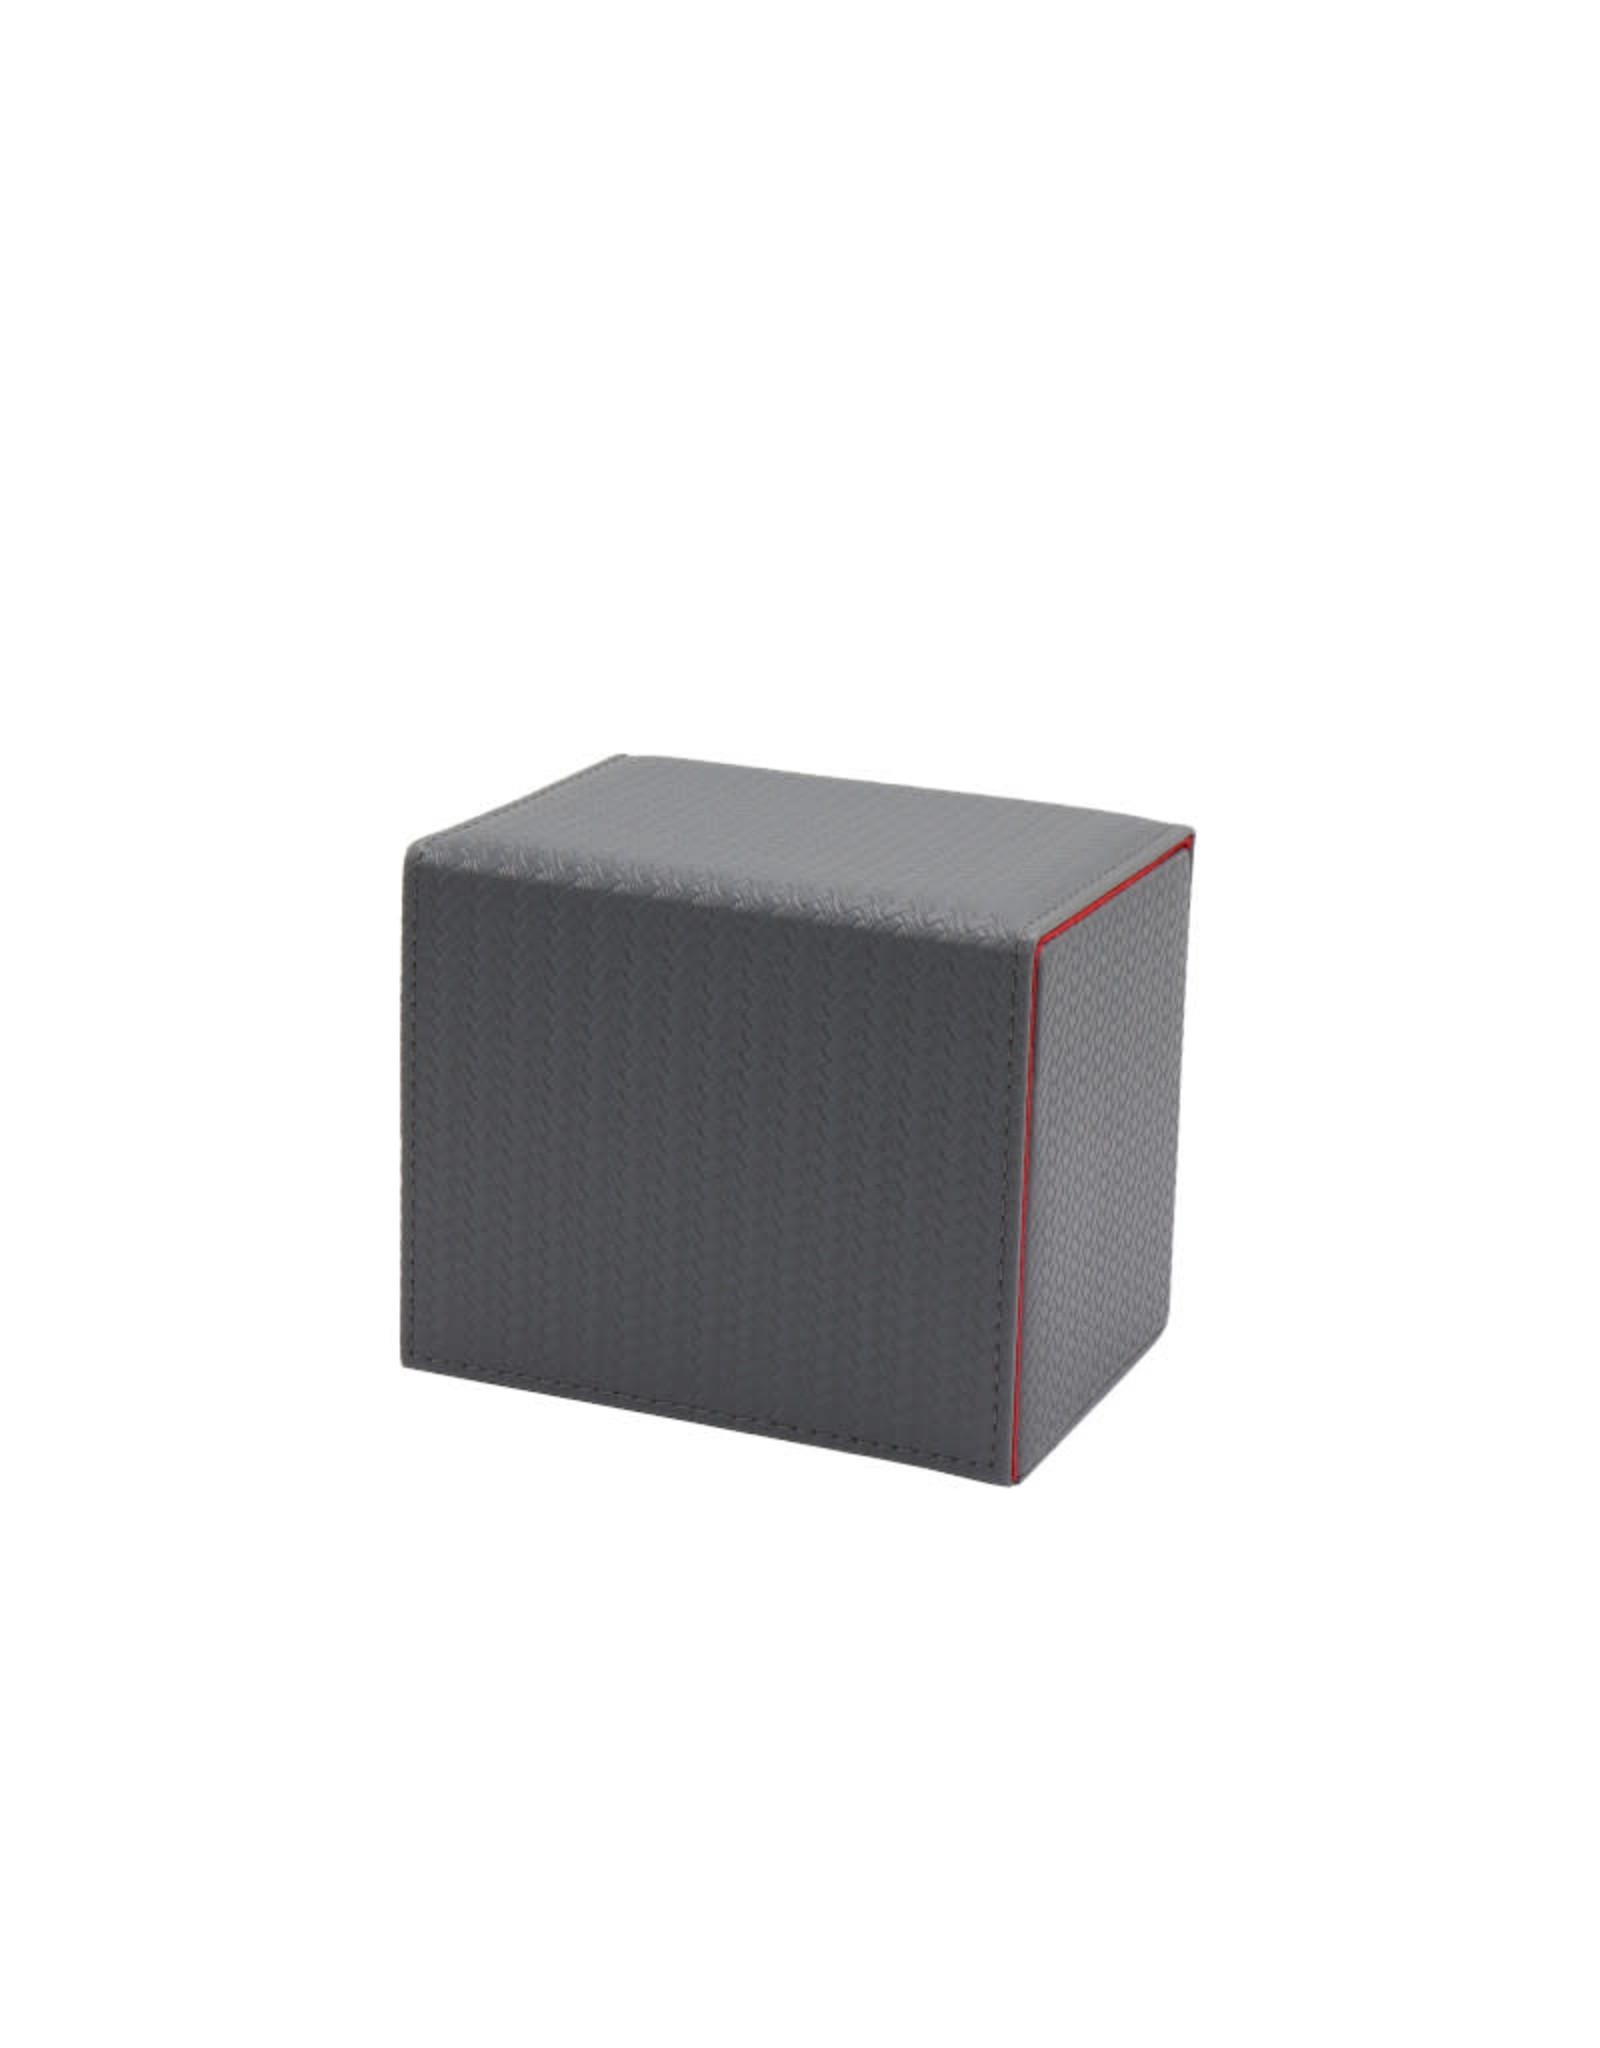 Dex Protection Deck Box: Proline 75+ Grey